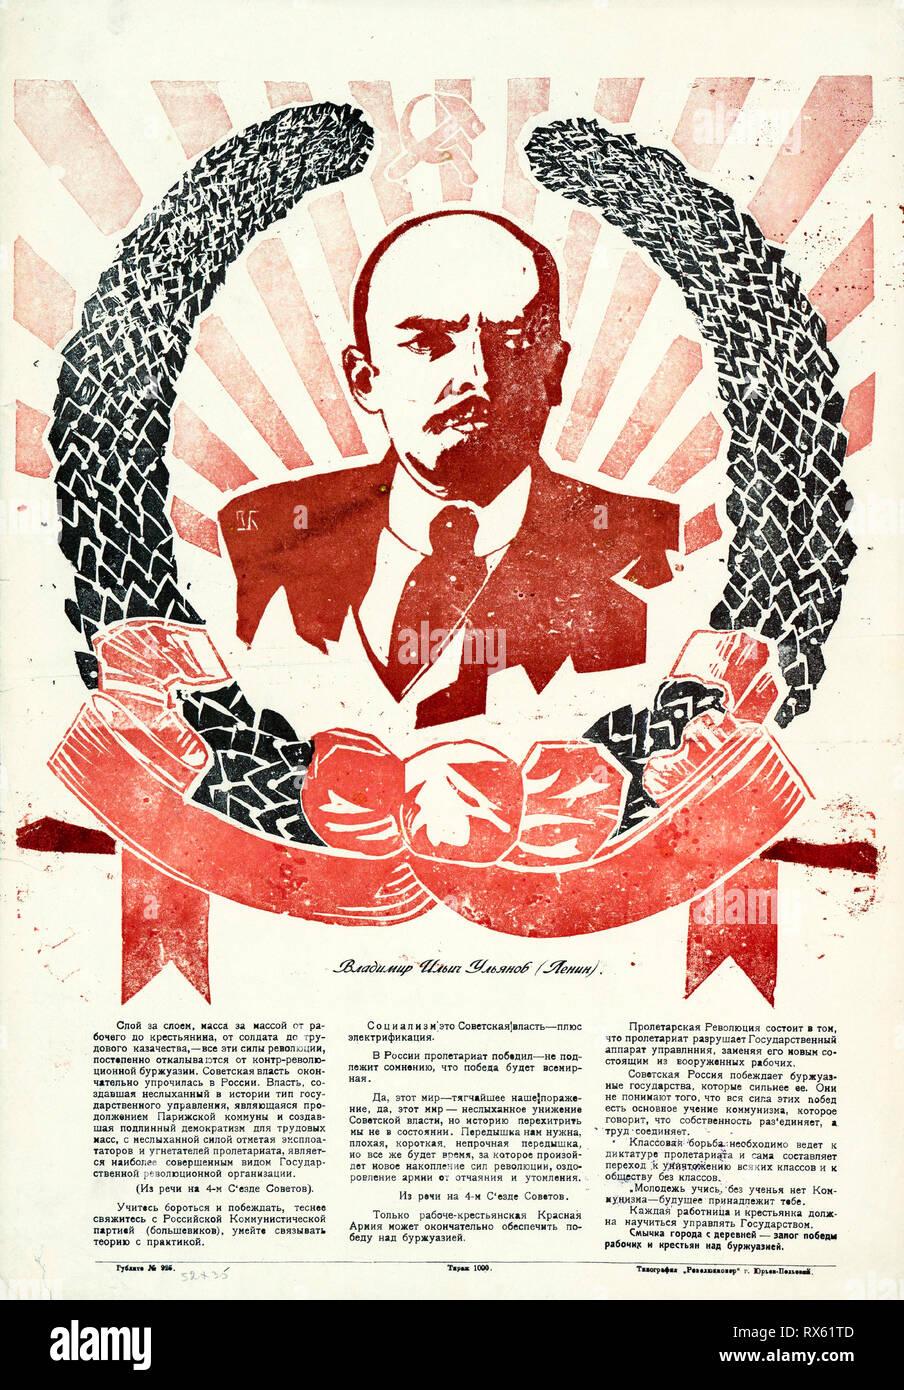 Vladimir Ilyich Ulyanov Lenin, poster, teachings, thoughts, 1924 - Stock Image